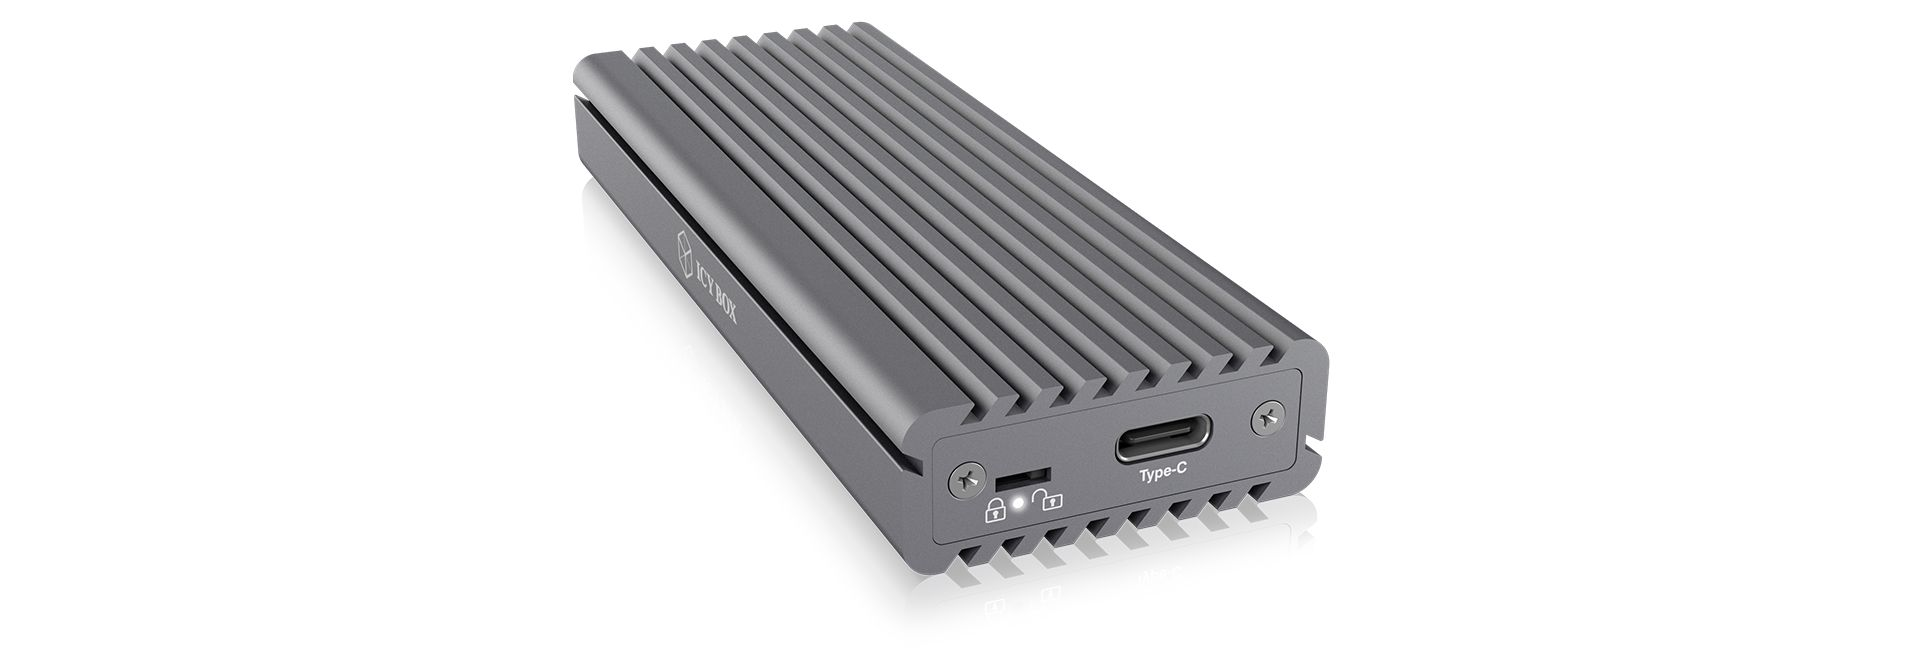 Raidsonic IcyBox IB-1817M-C31 External Type-C aluminium enclosure for M.2 NVMe SSD Grey (IB-1817M-C31)